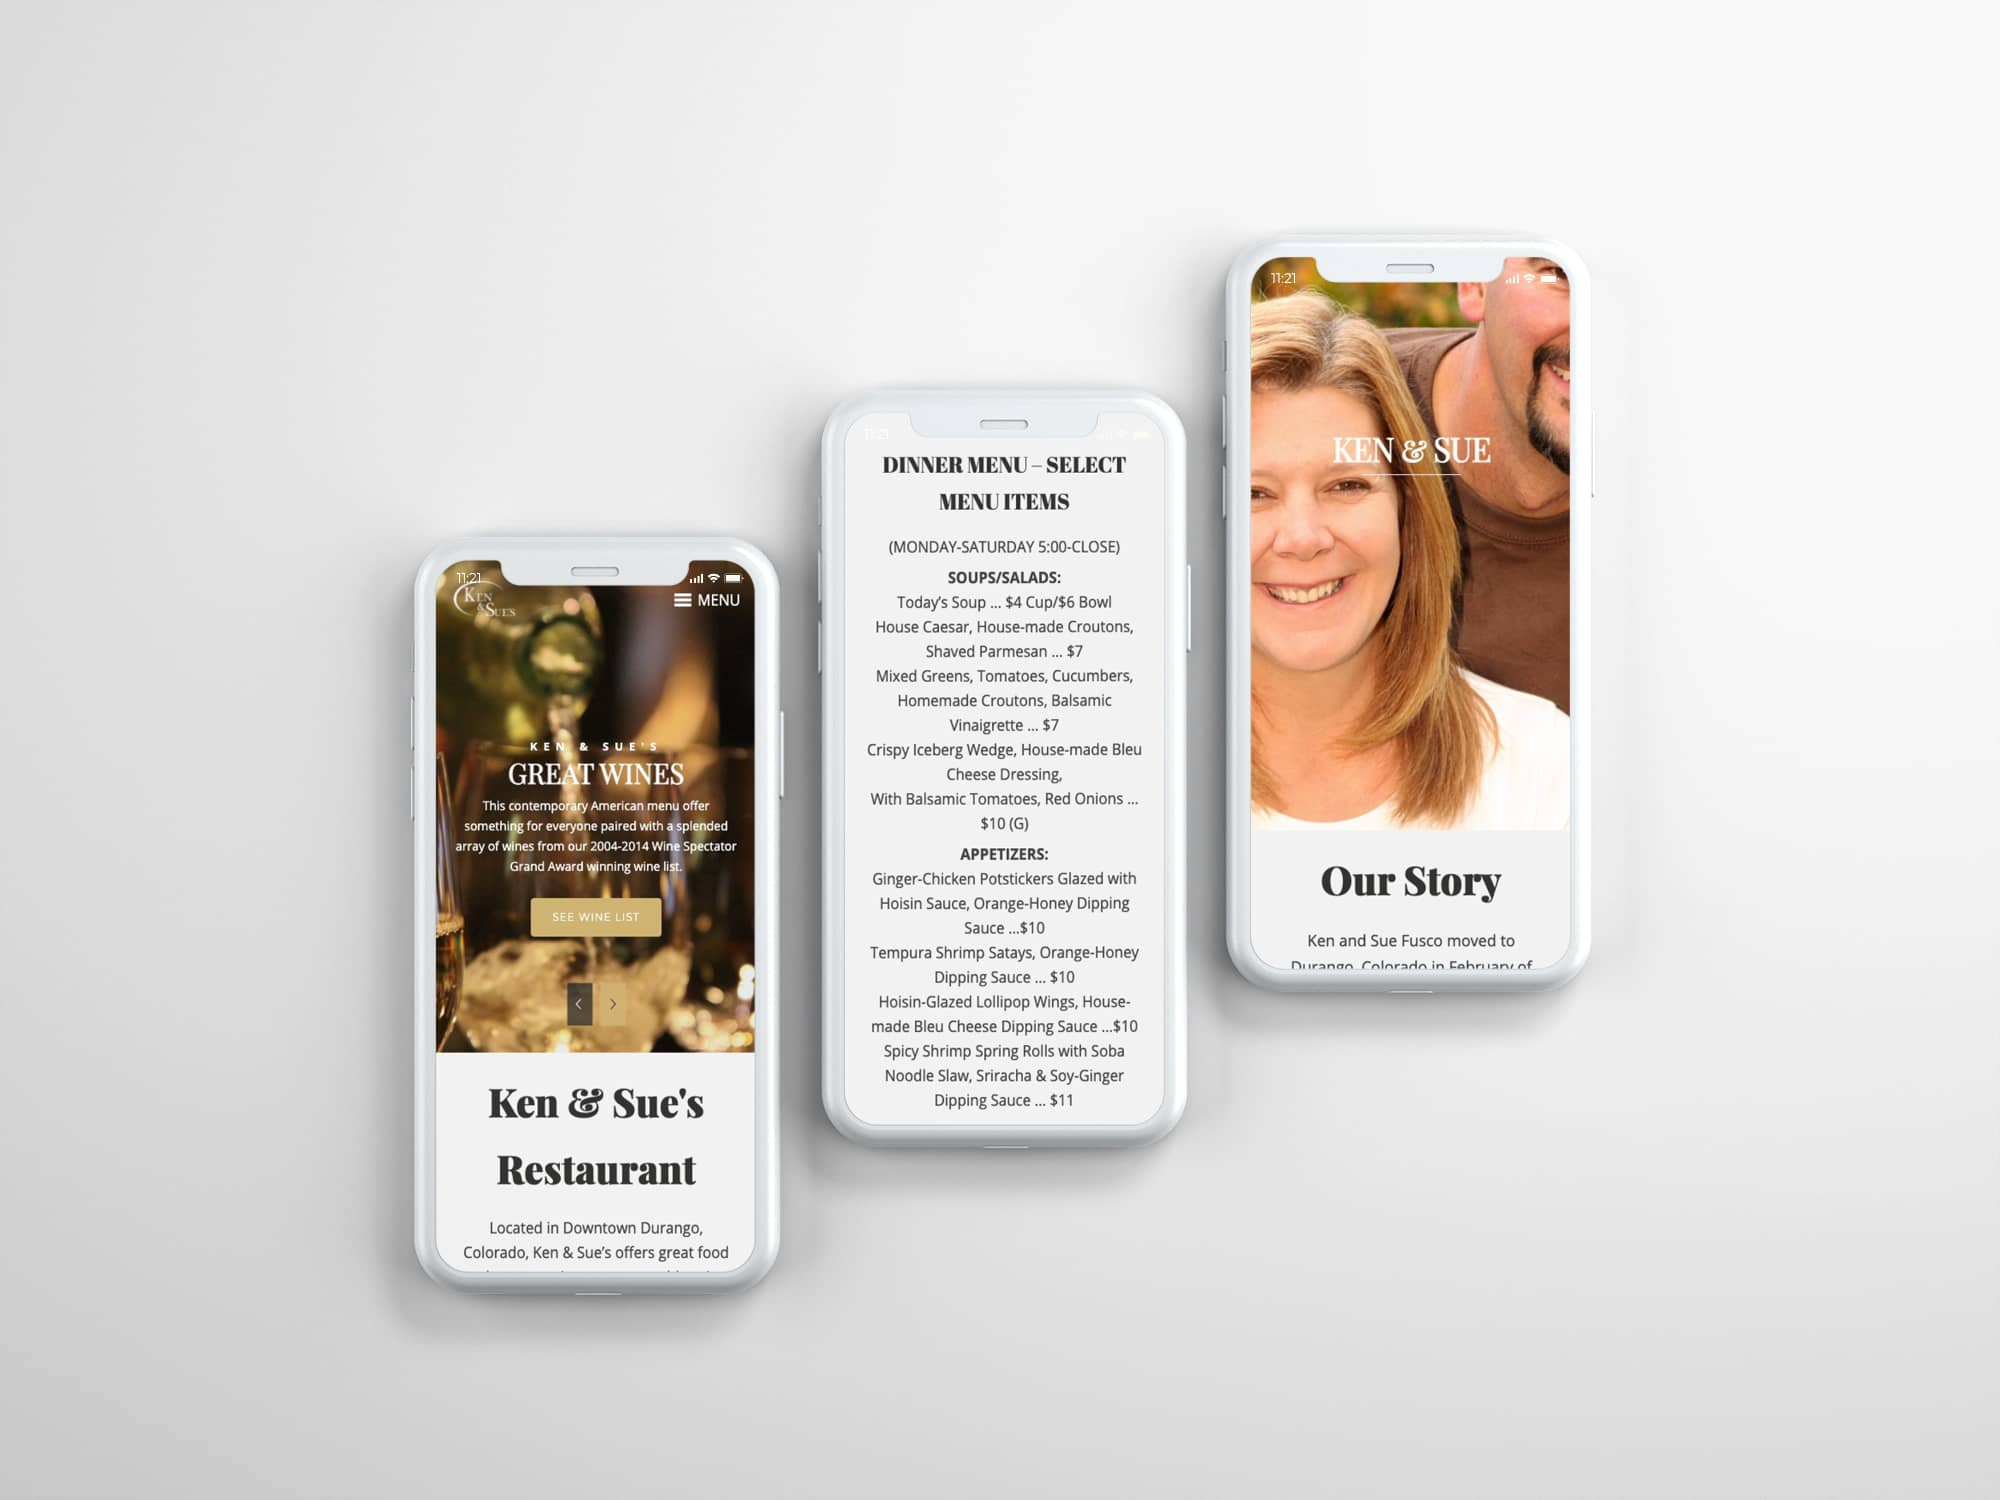 Ken & Sue's website on Mobile Phone